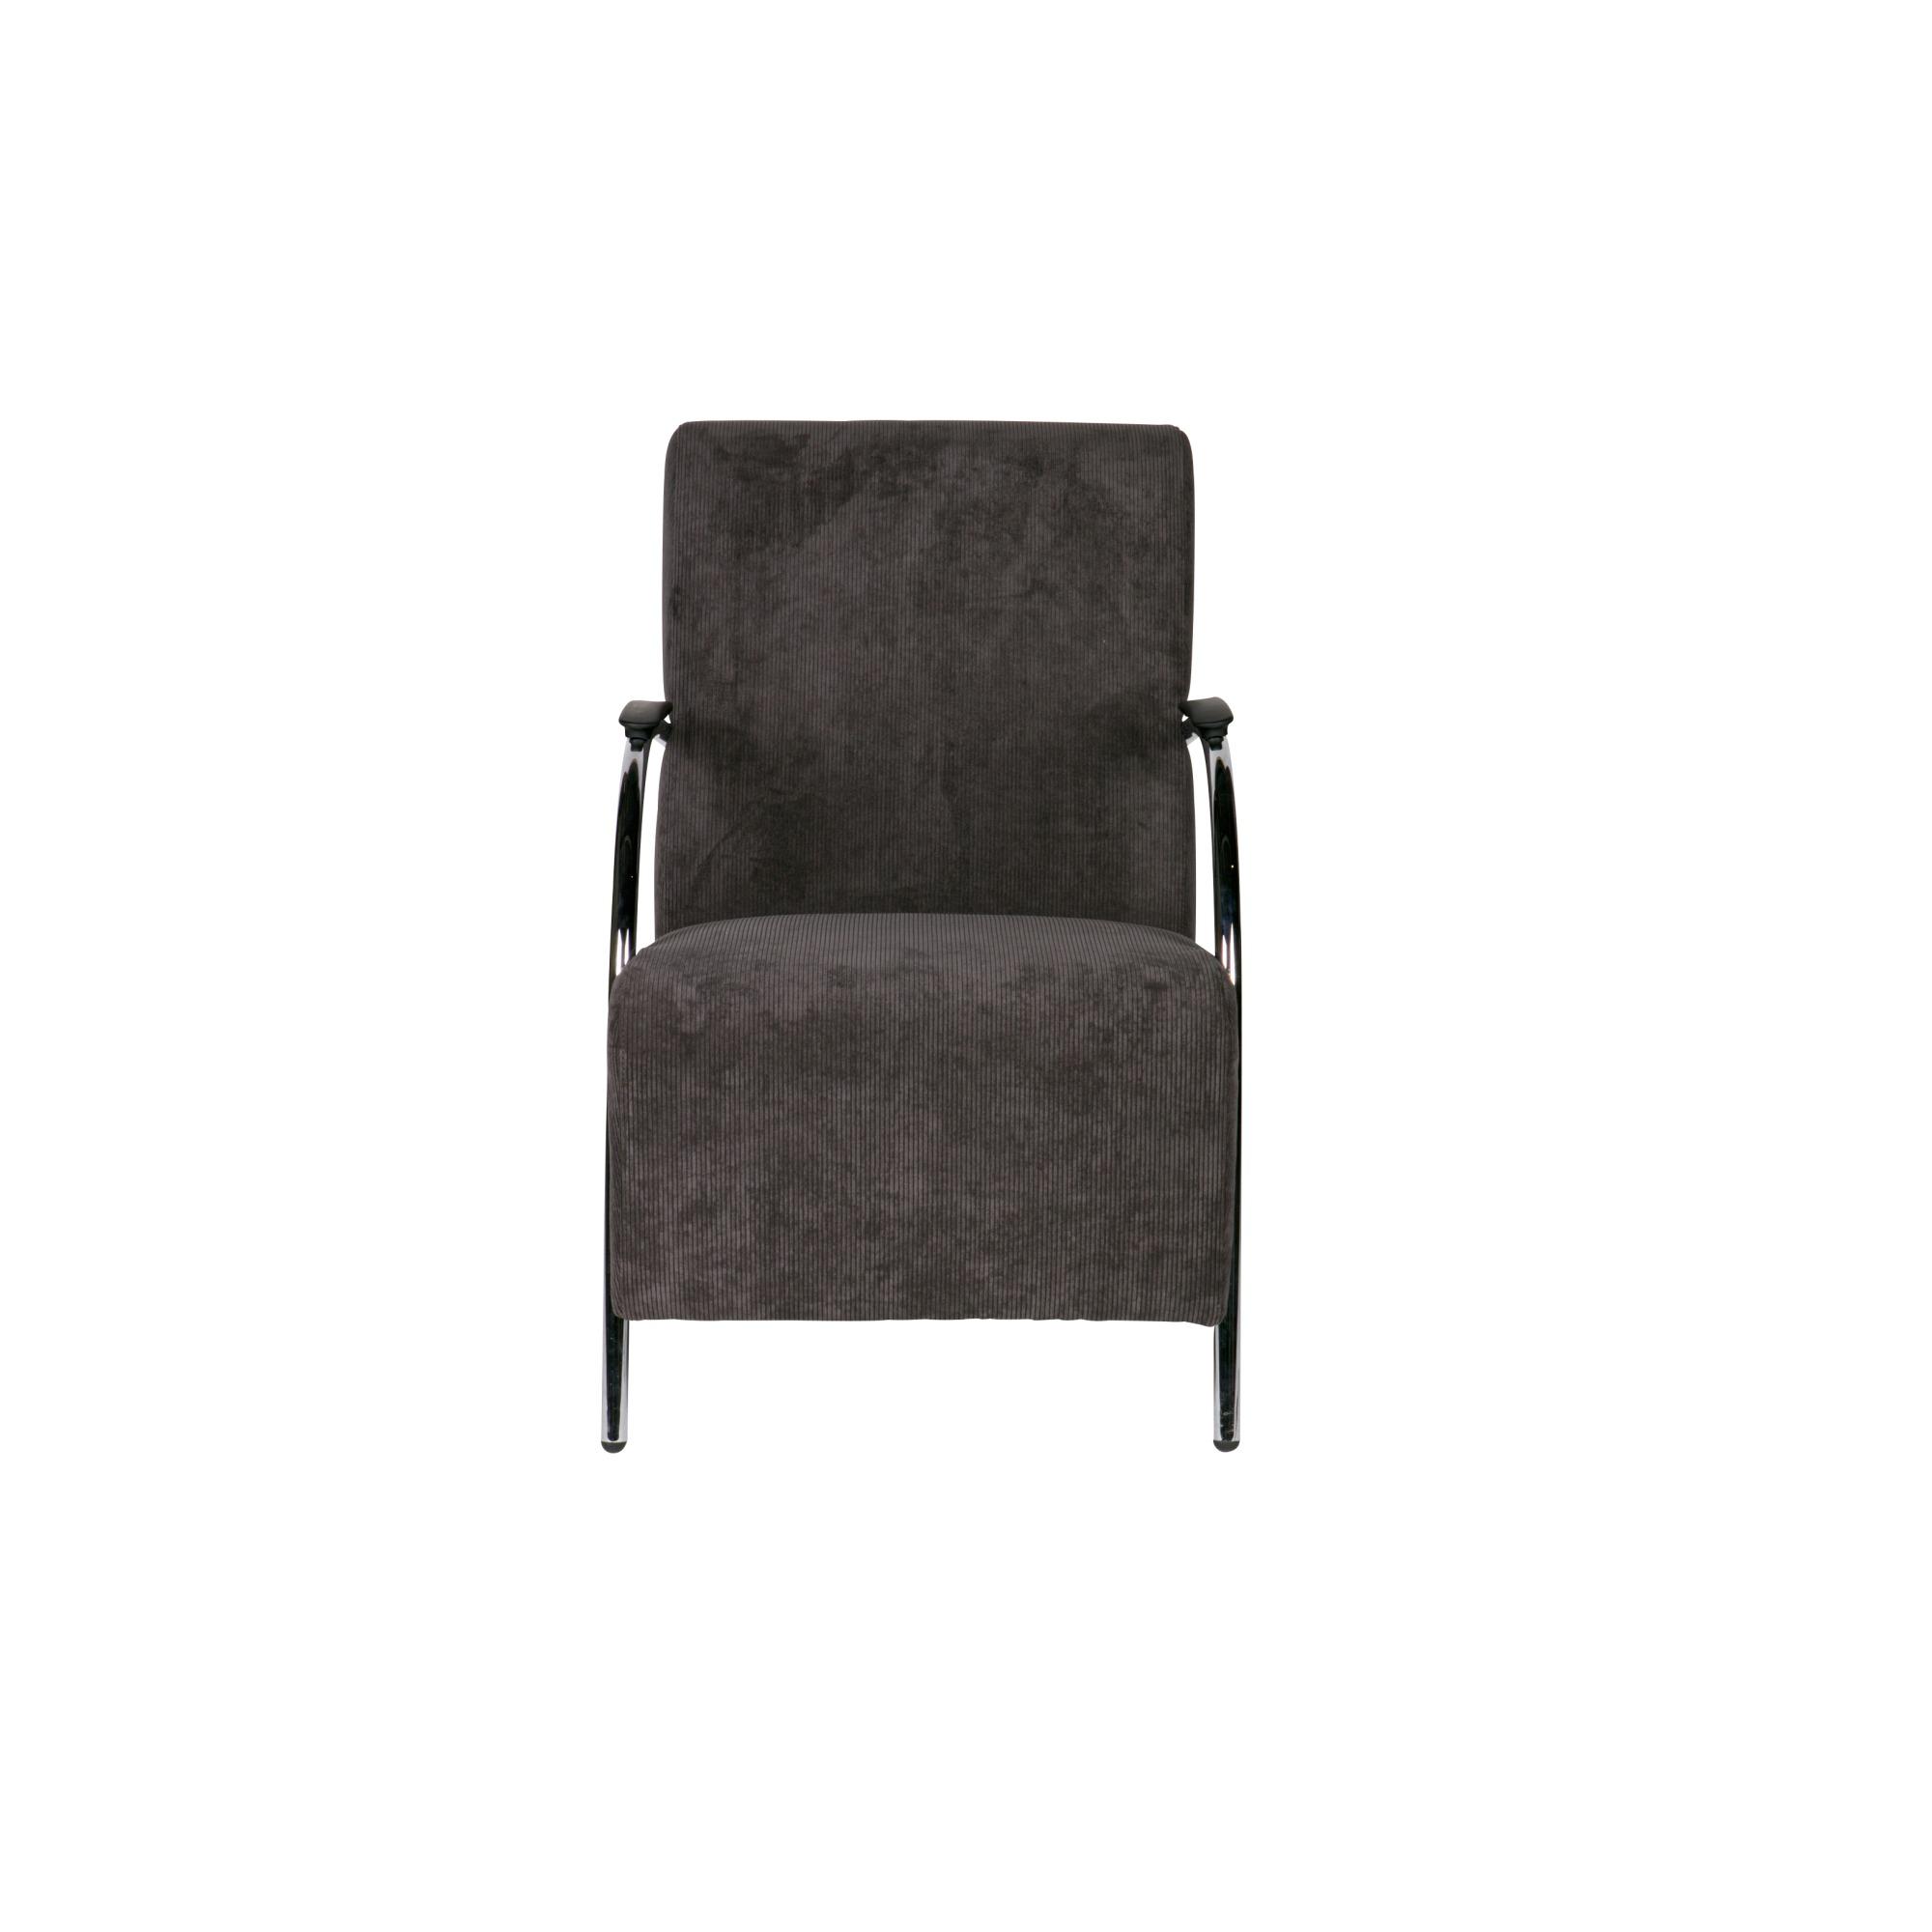 Halifax fauteuil antraciet